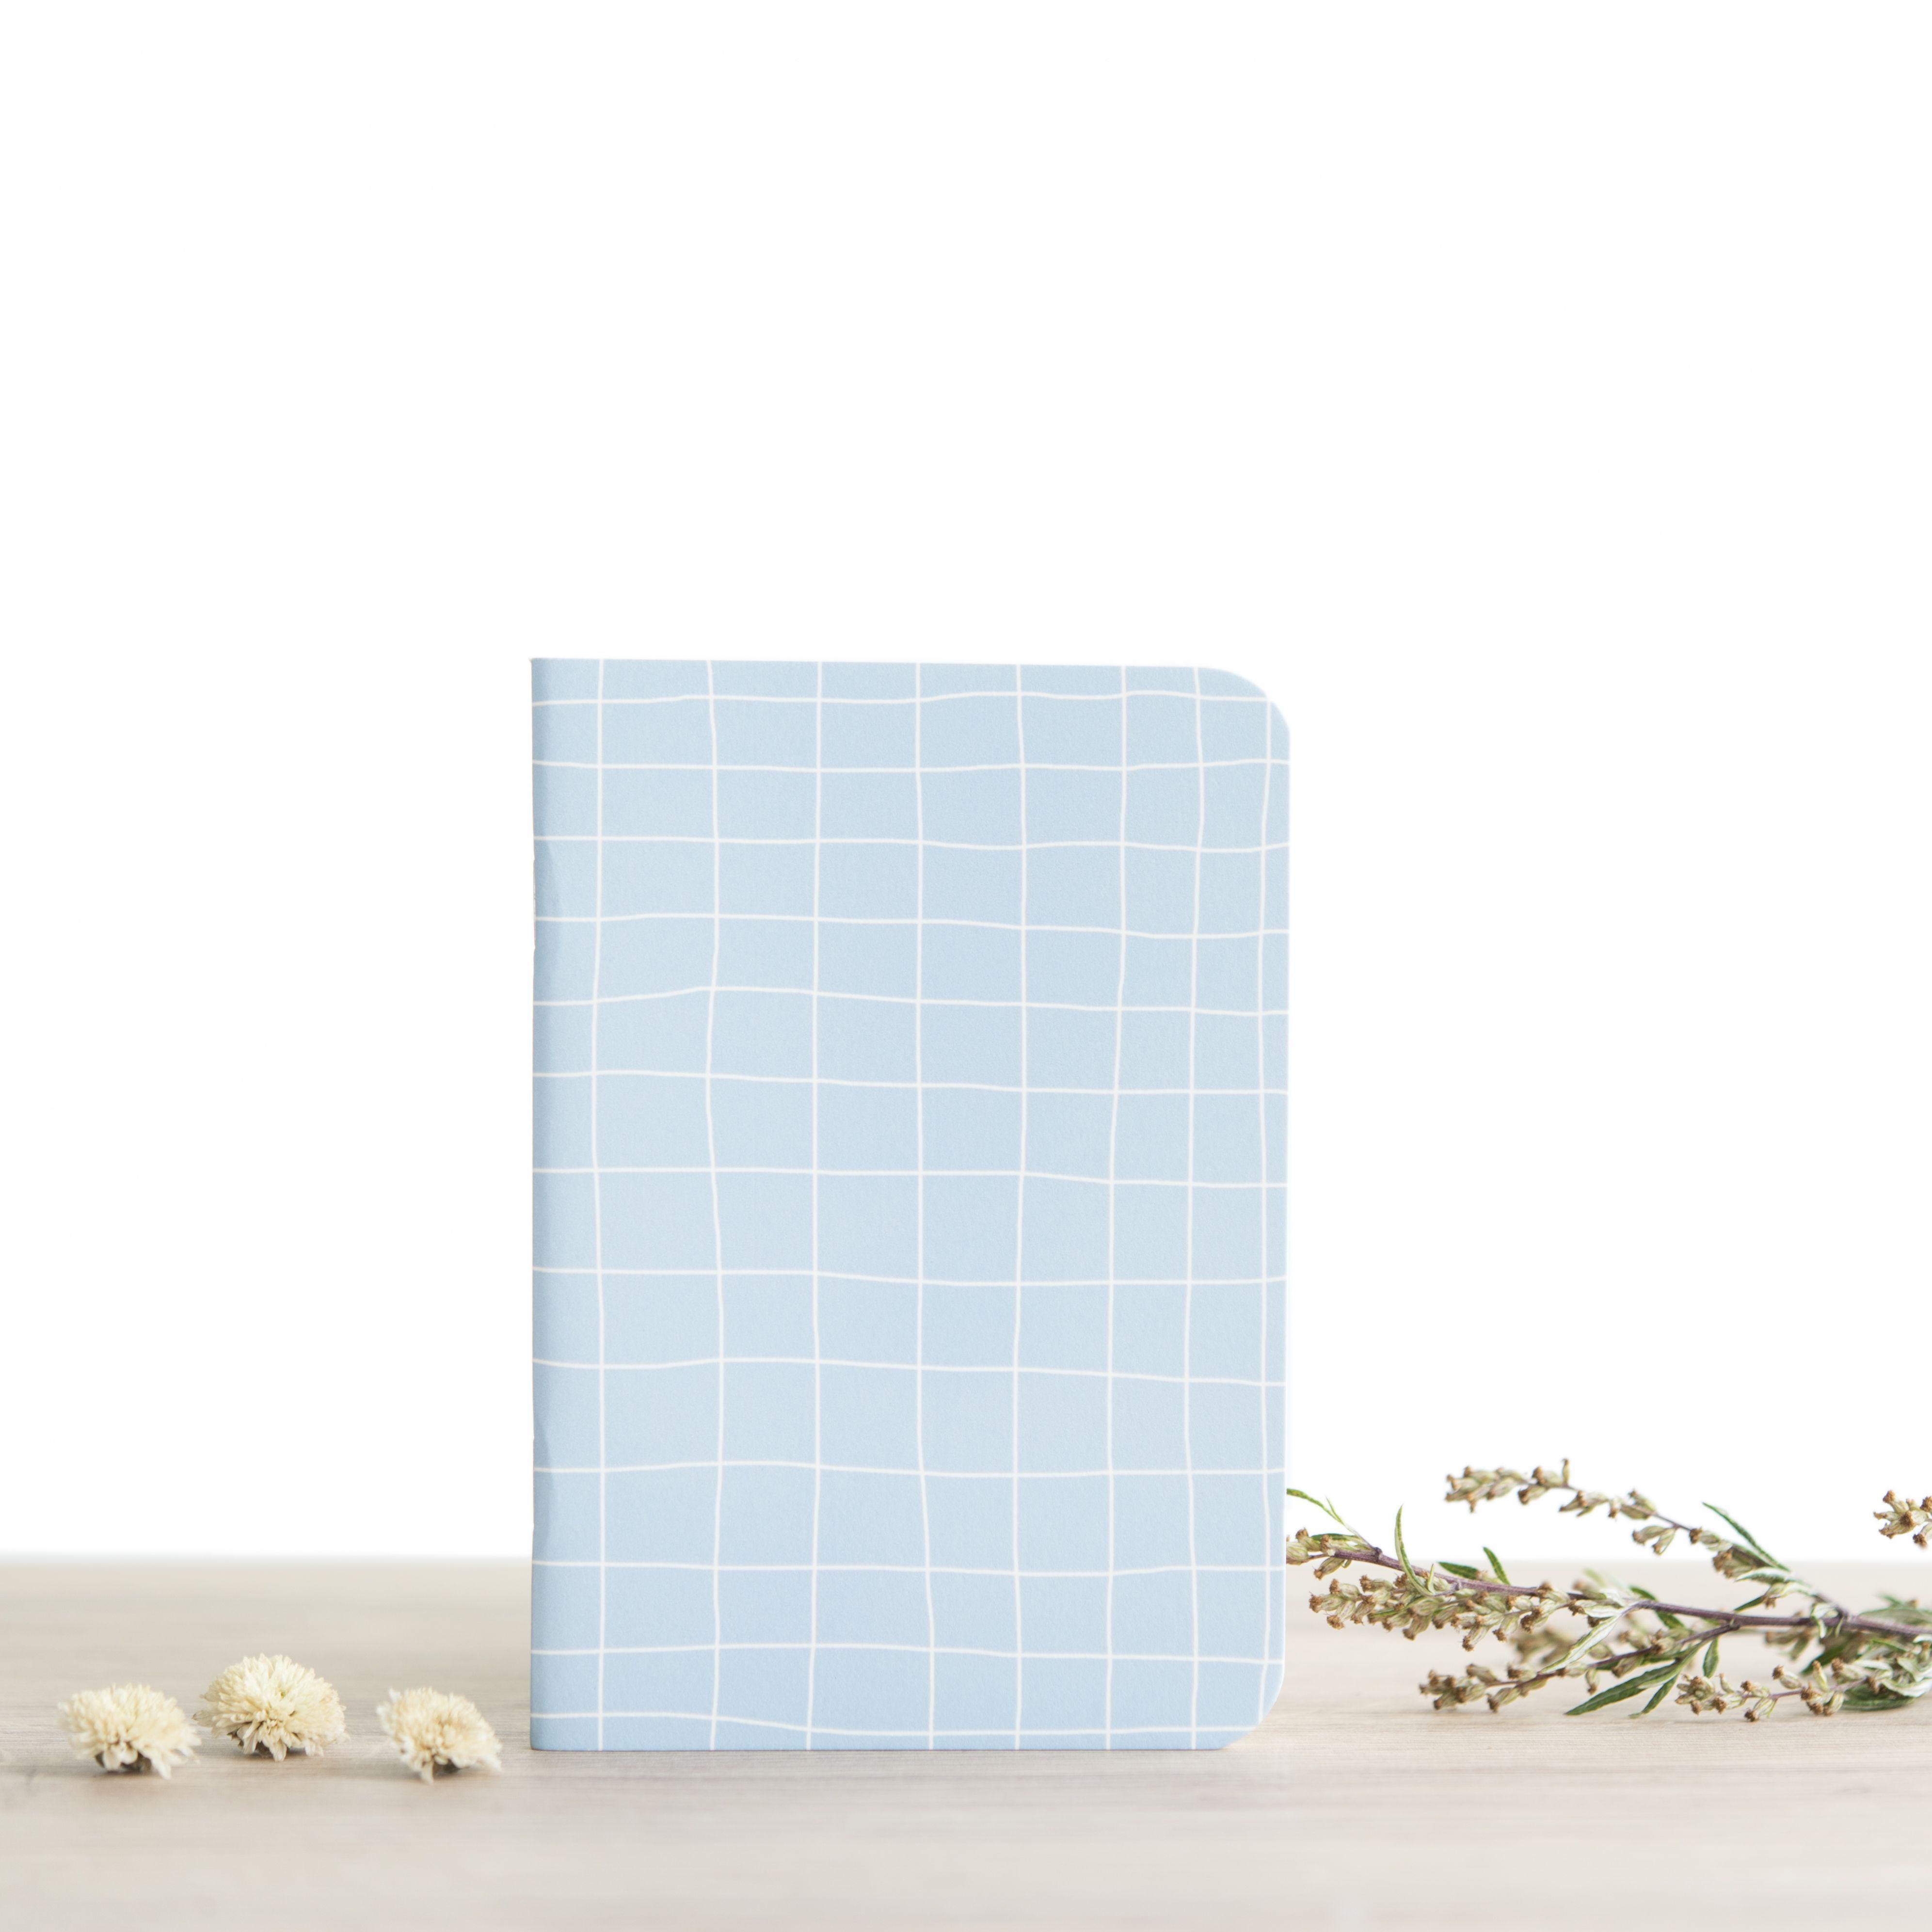 Atelier Bobbie A6 Notebook - Amélie - Blank